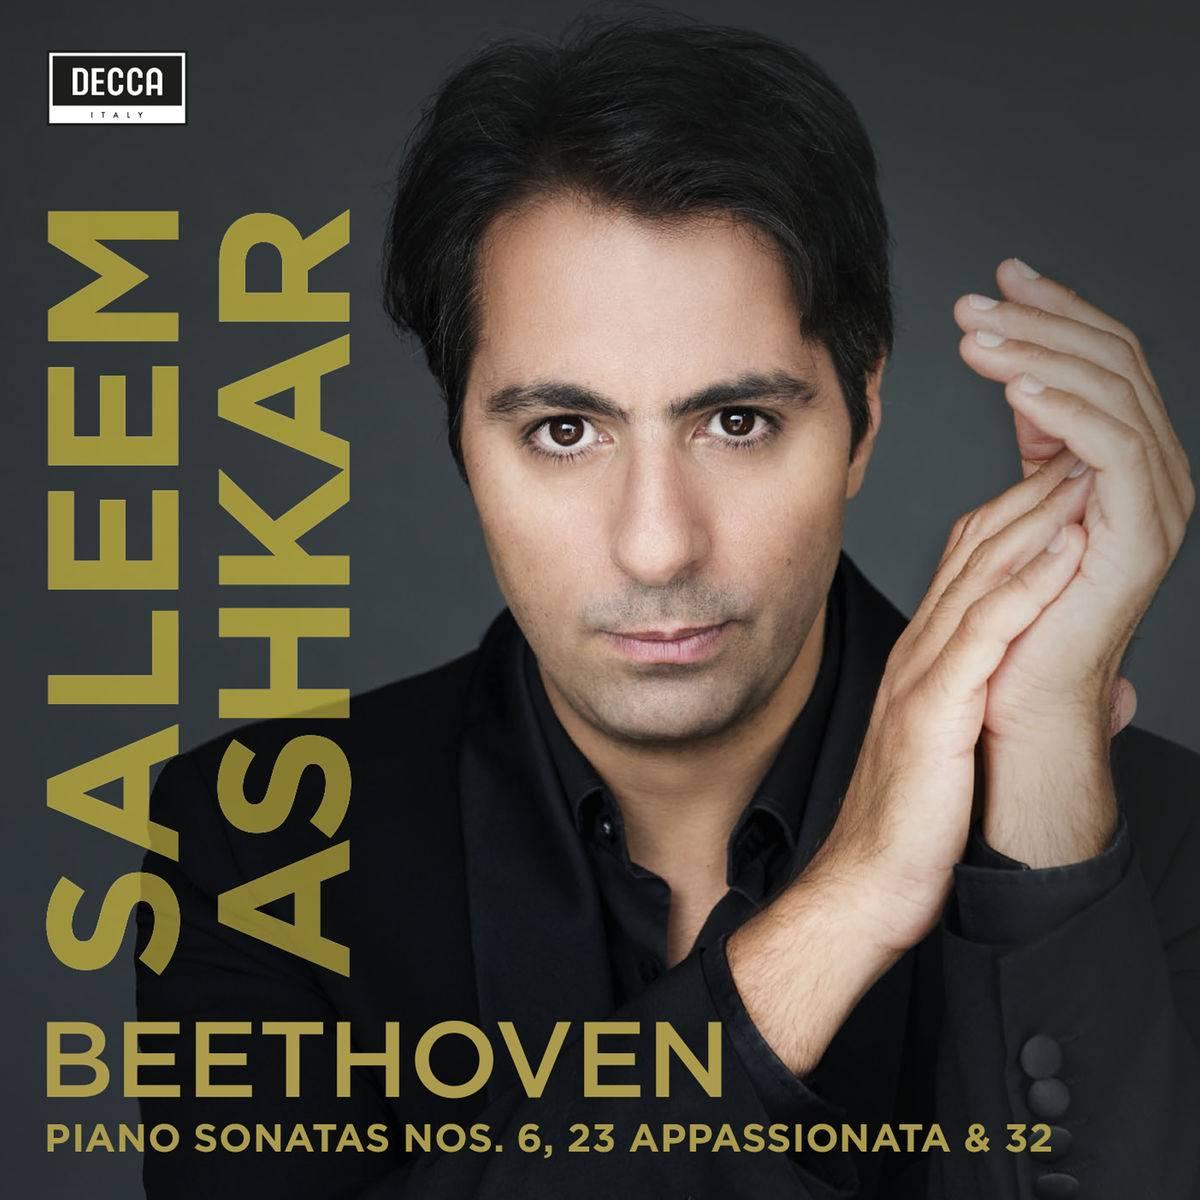 Saleem Ashkar - Beethoven: Piano Sonatas Nos. 6, 23 and 32 (2018)